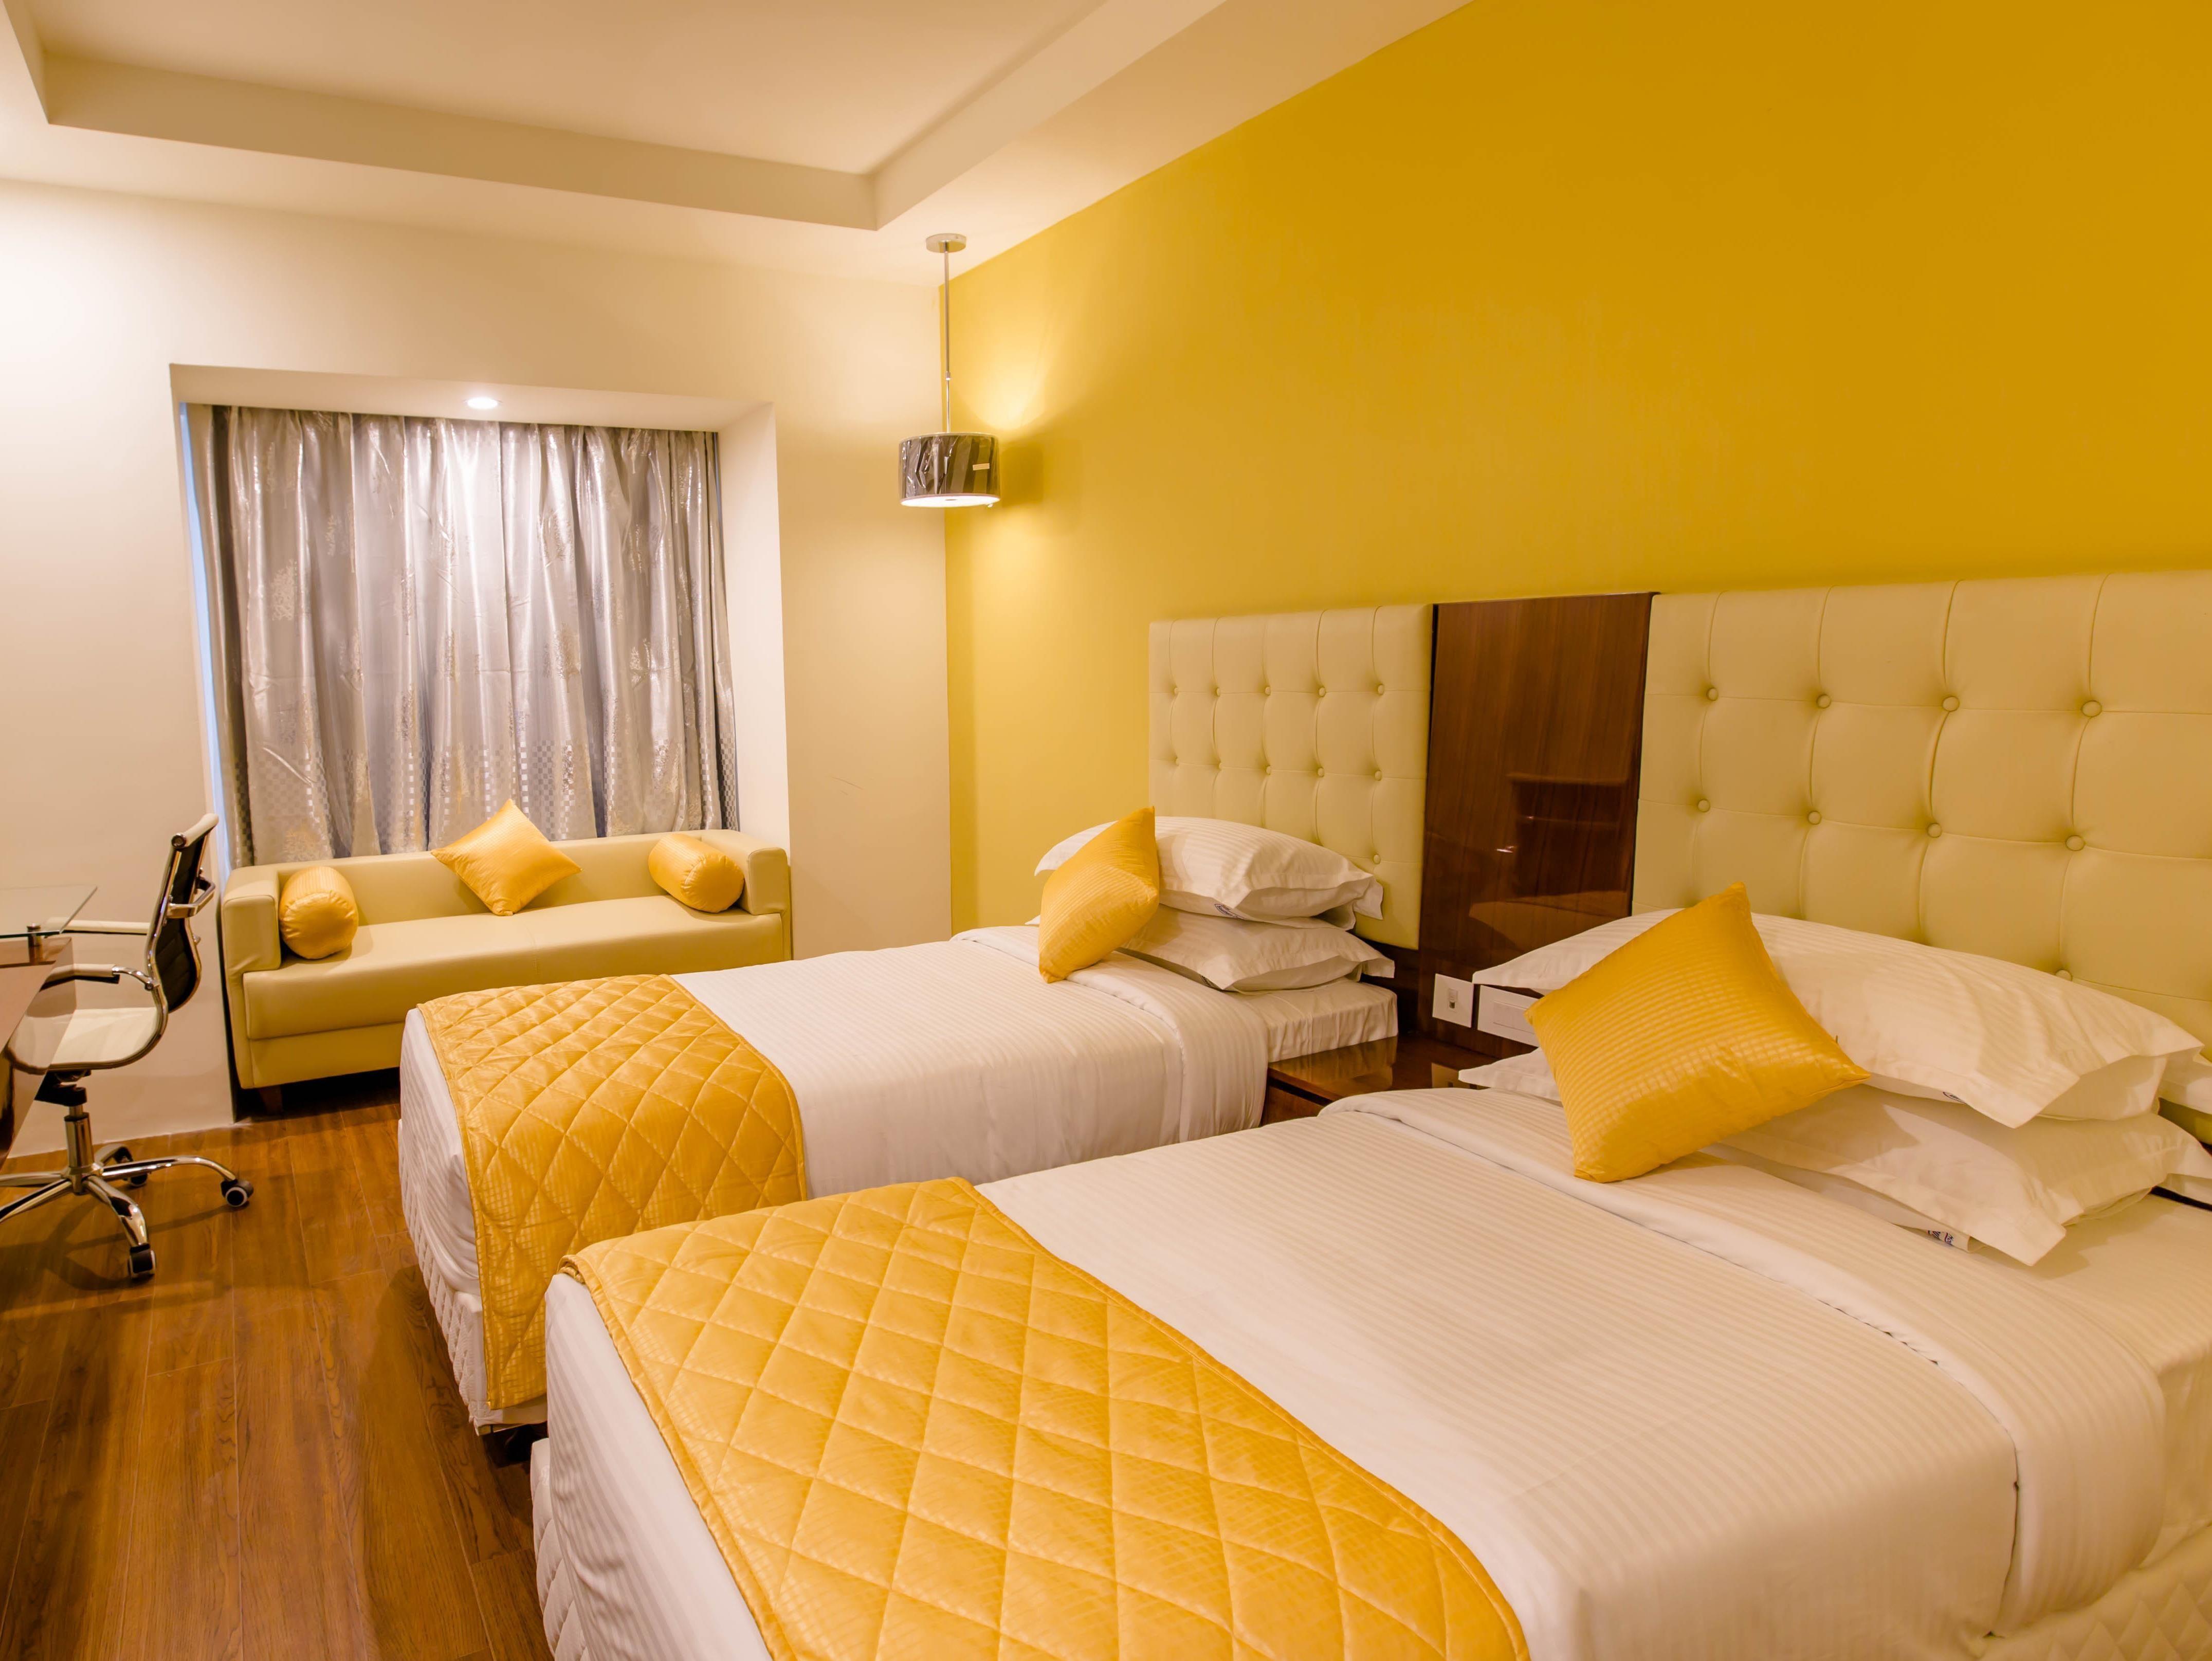 Quality Inn Airport Chennai India Southern Comfort Home Decor